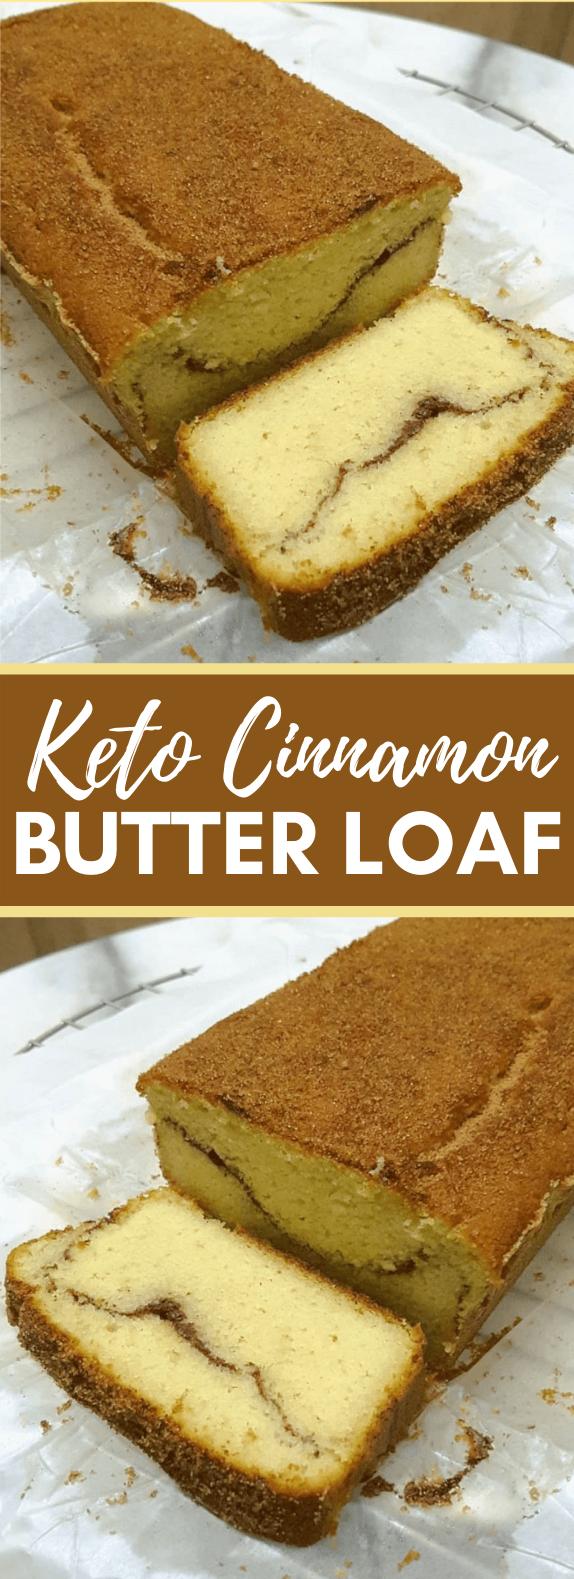 KETO CINNAMON BUTTER LOAF #healthy #bread